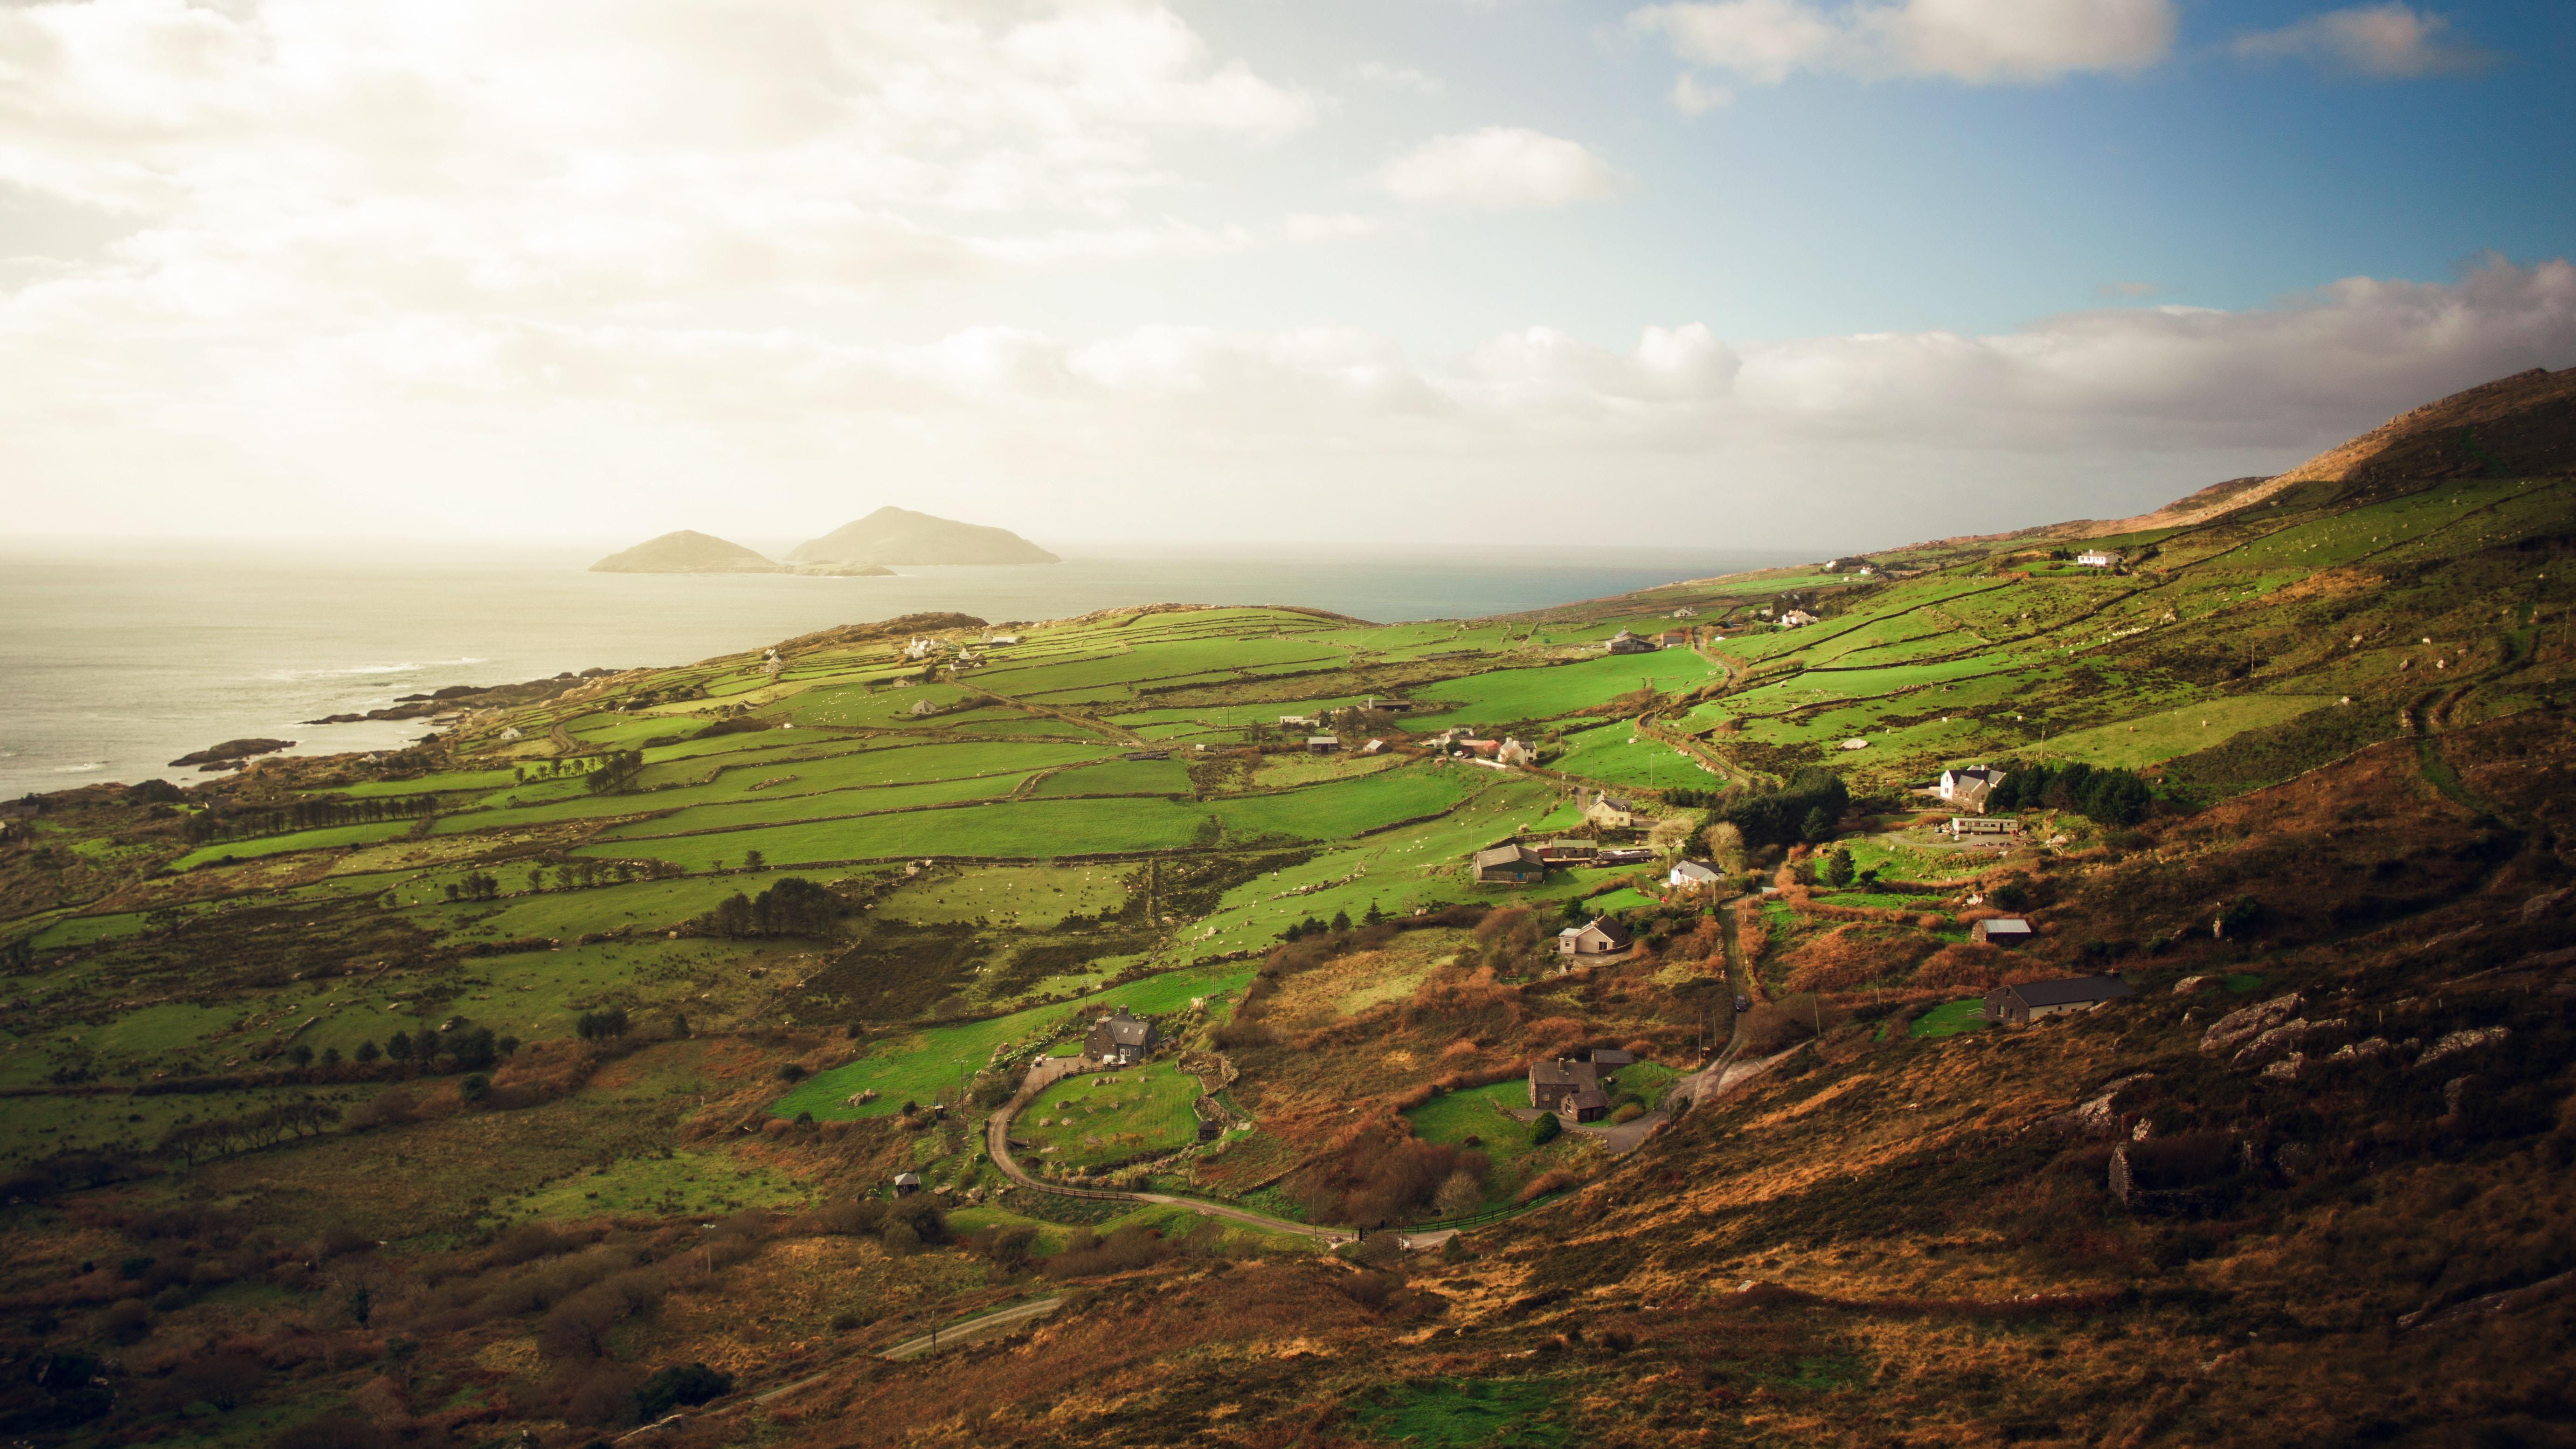 Image of the Irish countryside